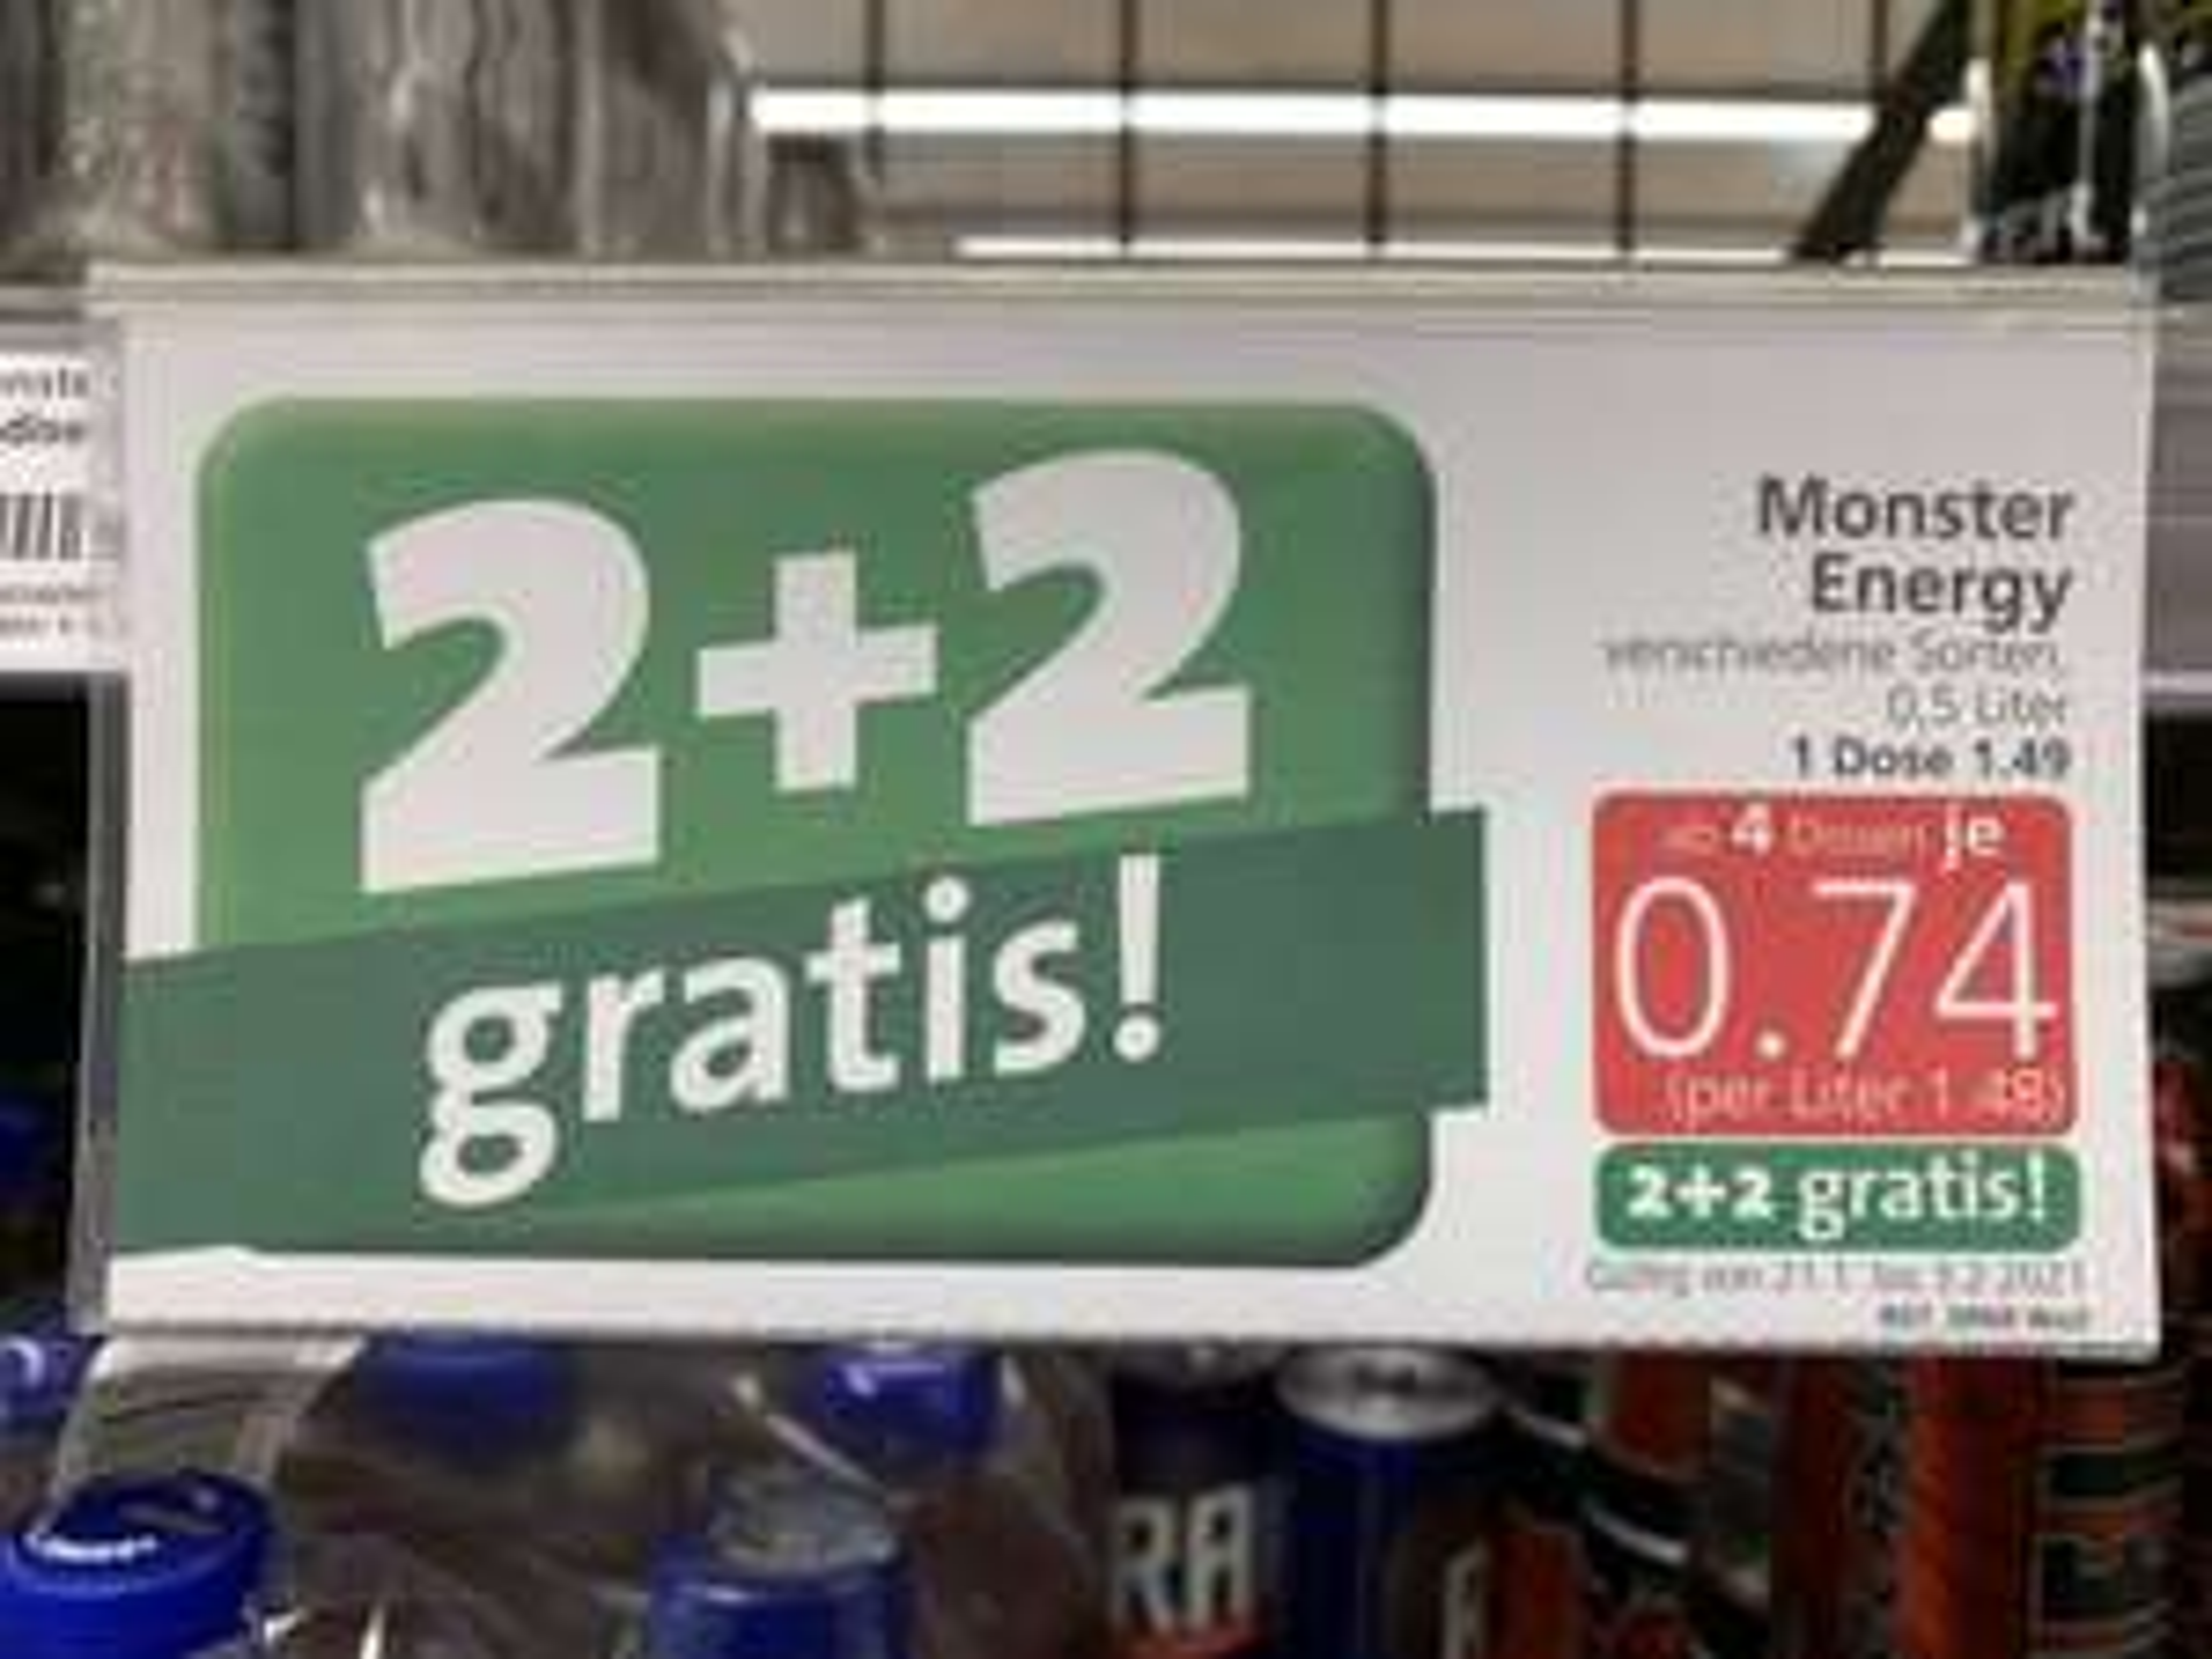 2+2 gratis auf Monster Energy bei Spar/Eurospar/Interspar